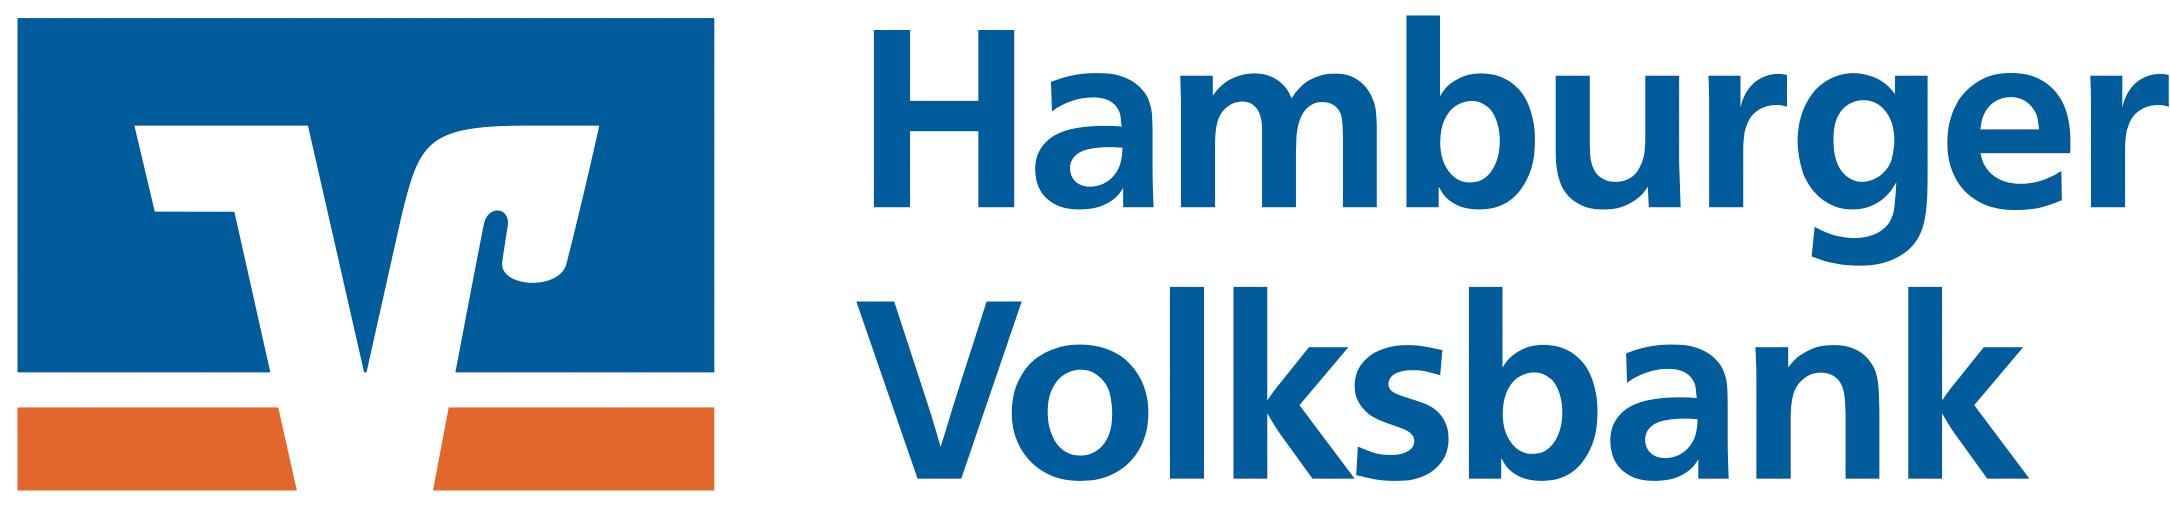 Hamburg Volksbank Logo